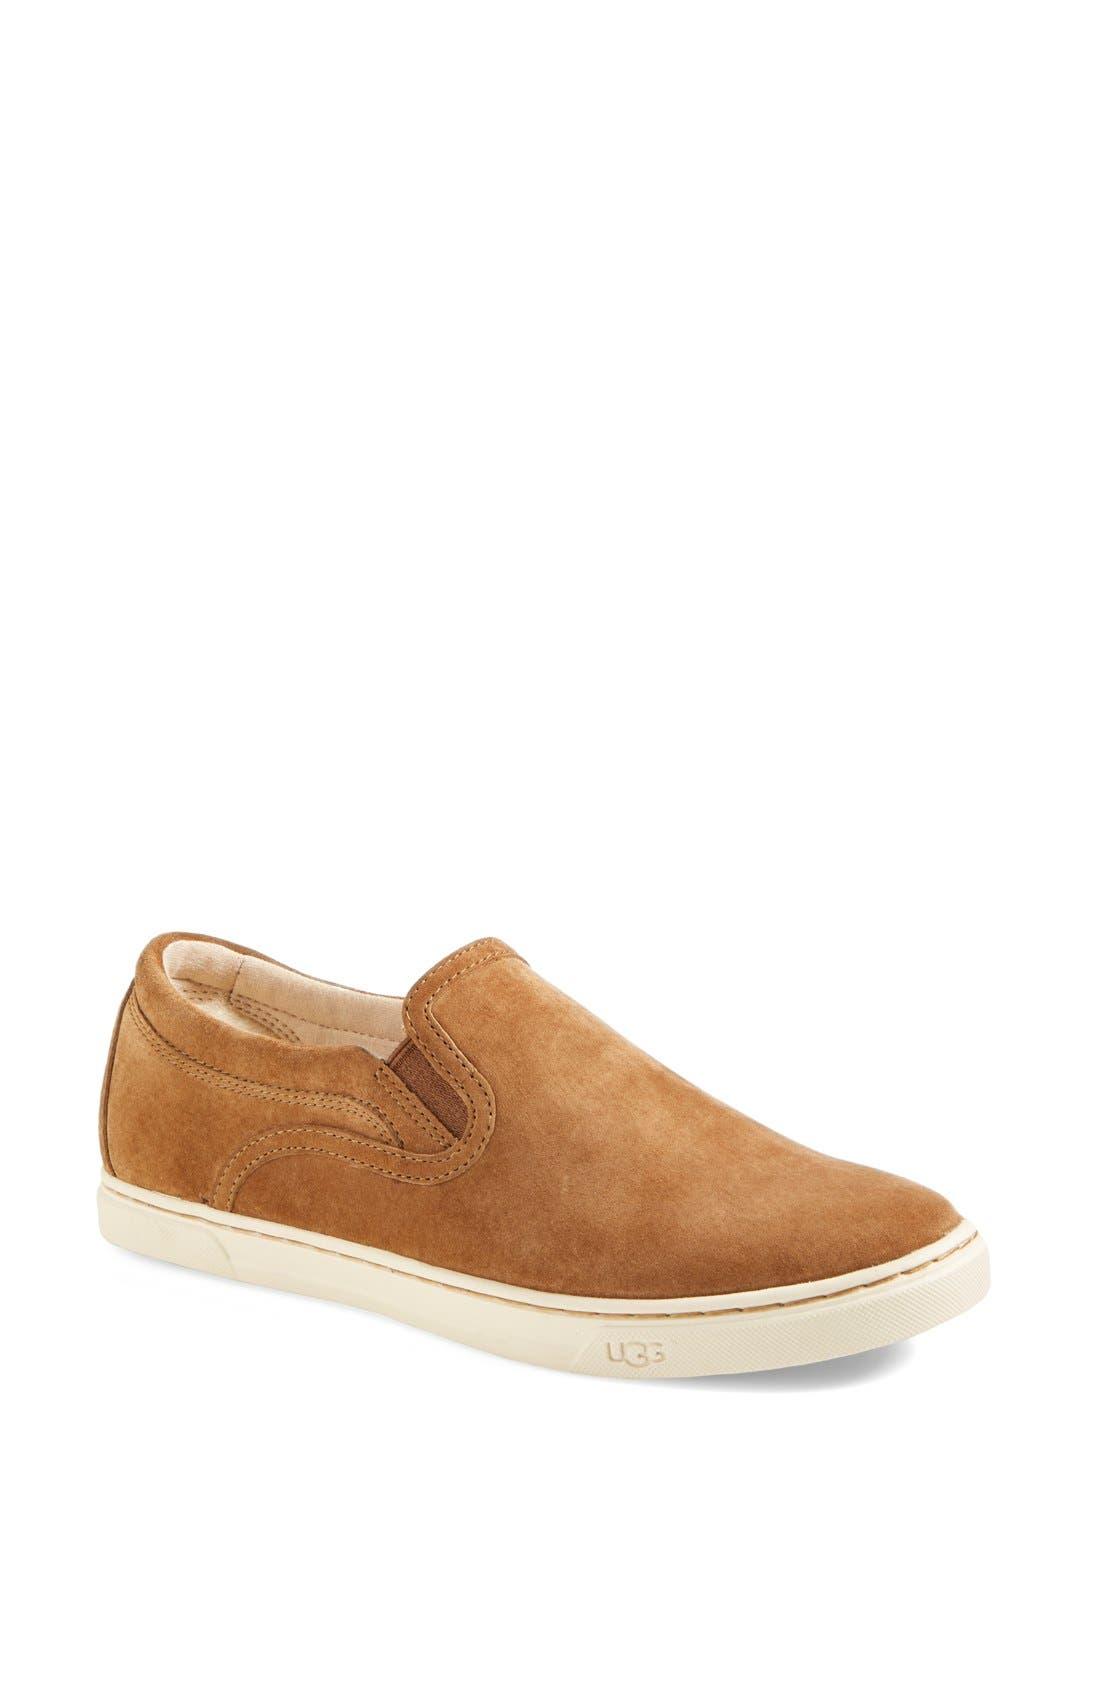 Alternate Image 1 Selected - UGG® Fierce Water Resistant Suede Slip-On Sneaker (Nordstrom Exclusive Color) (Women)